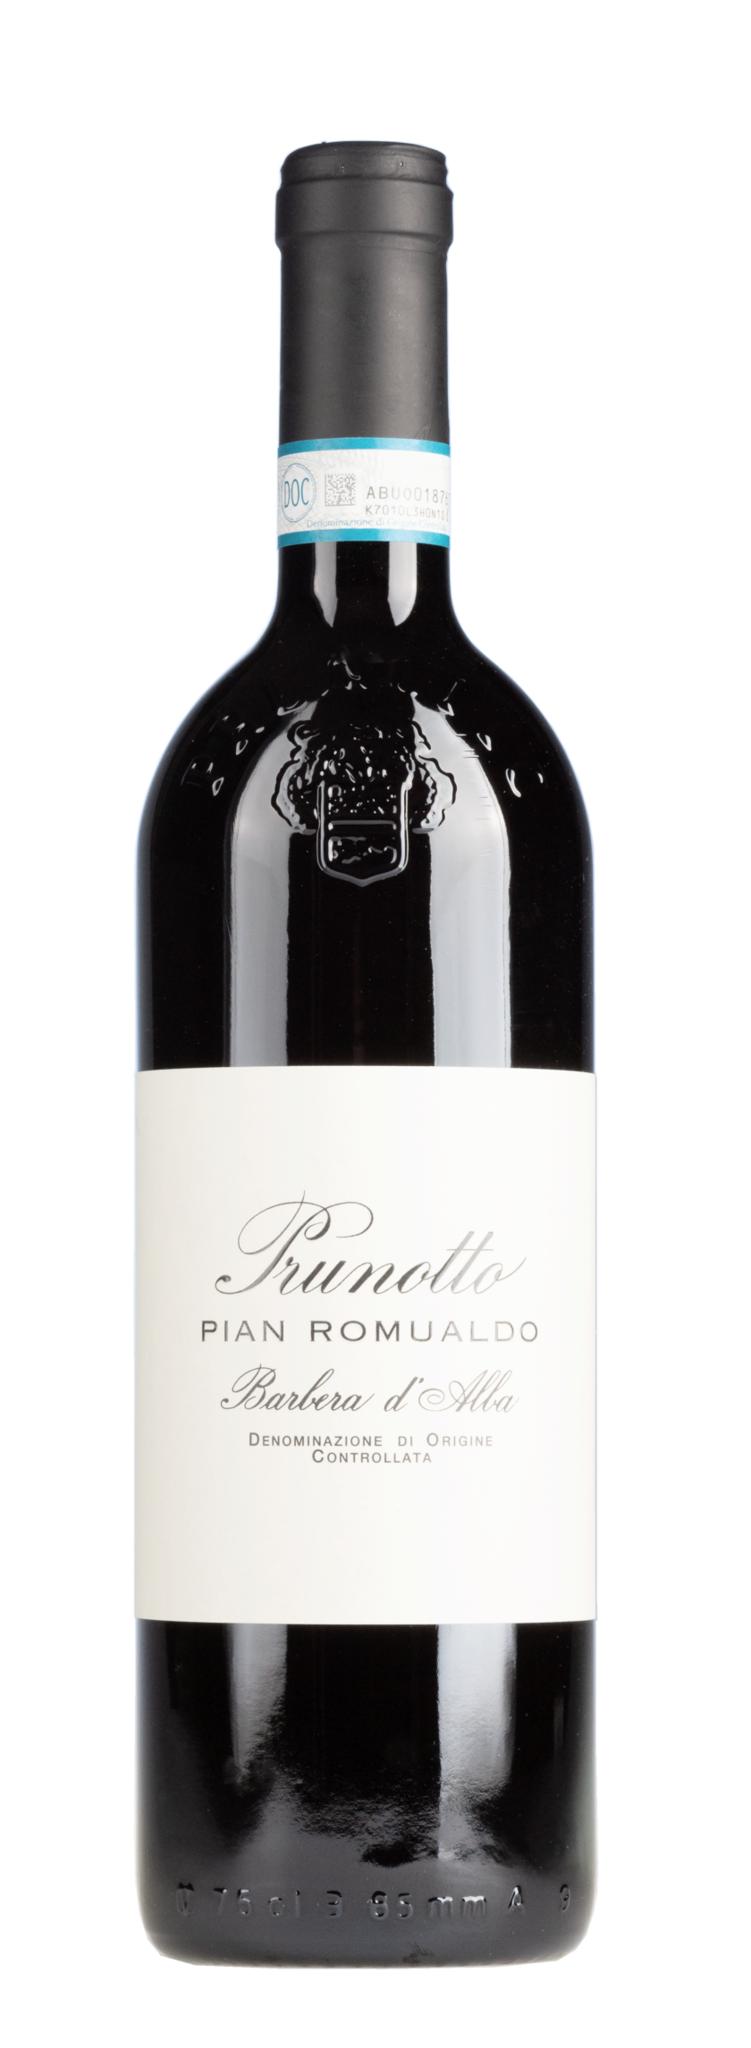 Prunotto - Piemont 2018 Barbera d'Alba Pian Romualdo, Prunotto